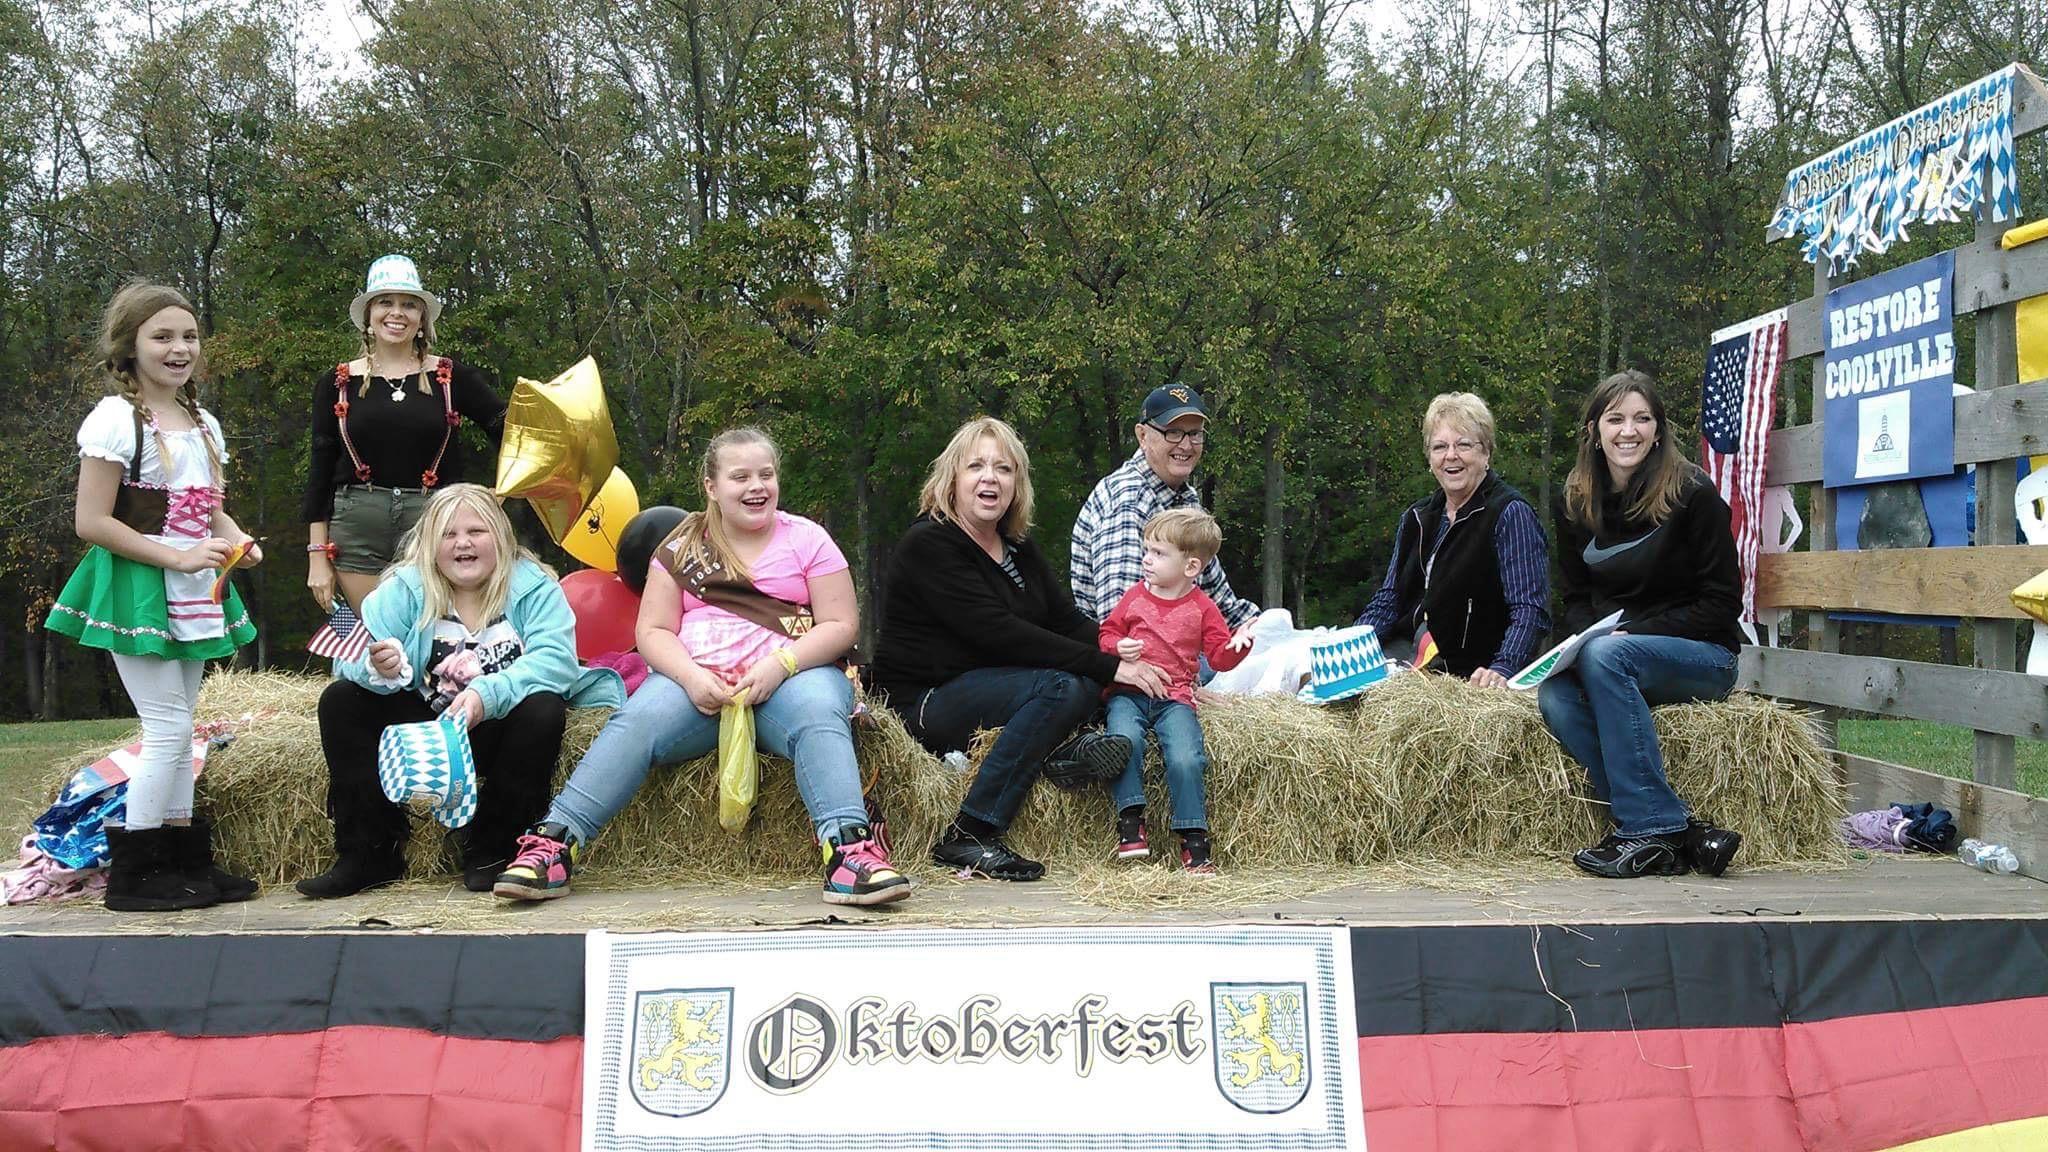 Octoberfest 2016